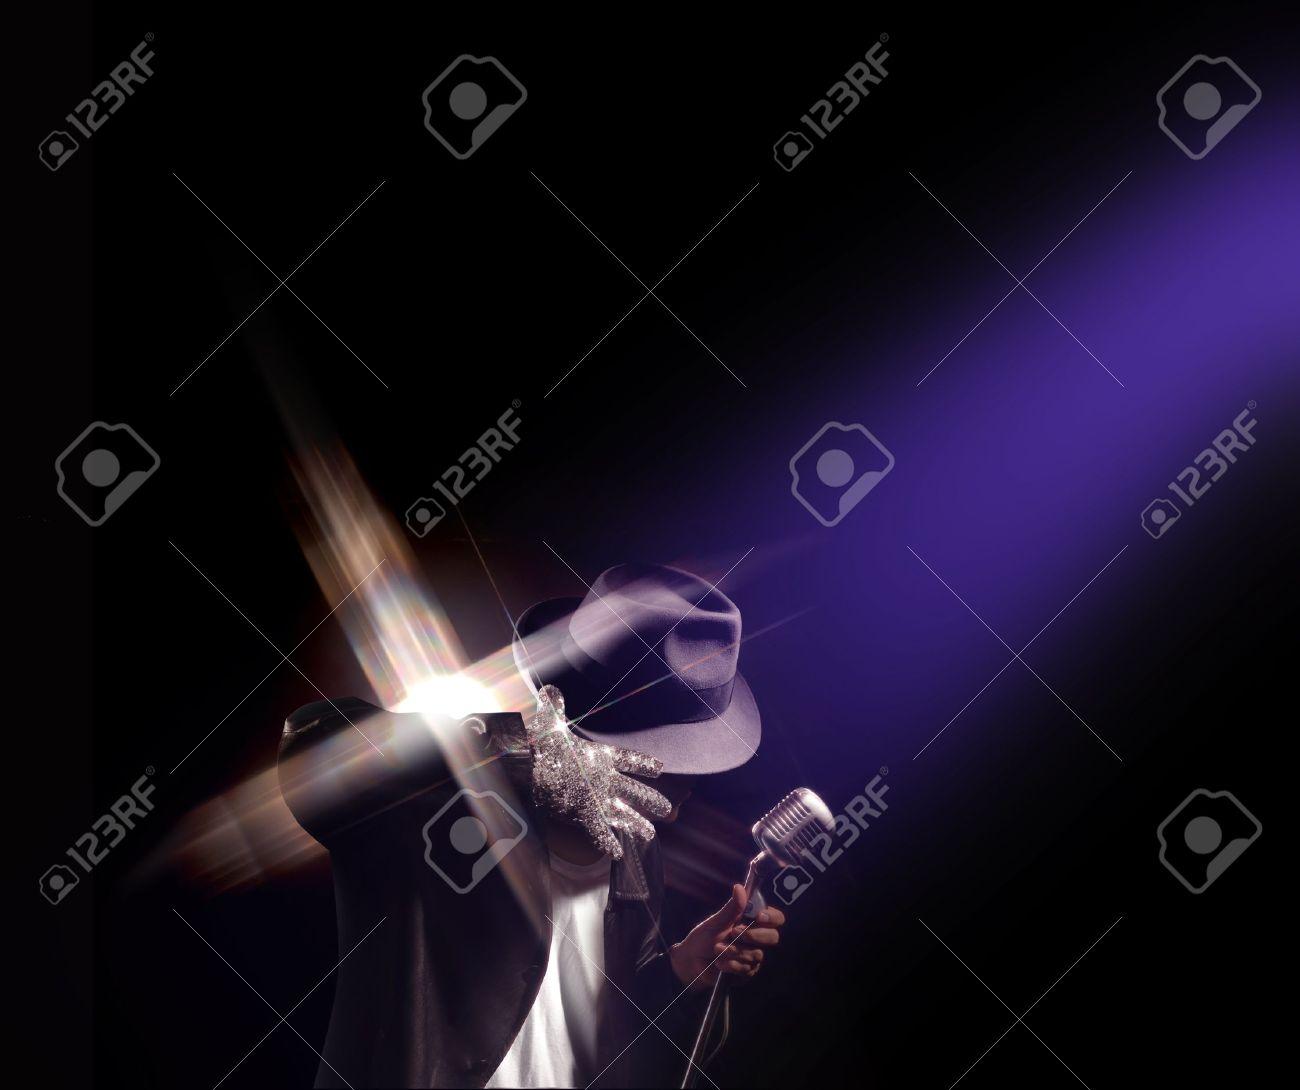 Spotlight shining down on a Michael Jackson impersonator performing. Stock Photo - 15442327